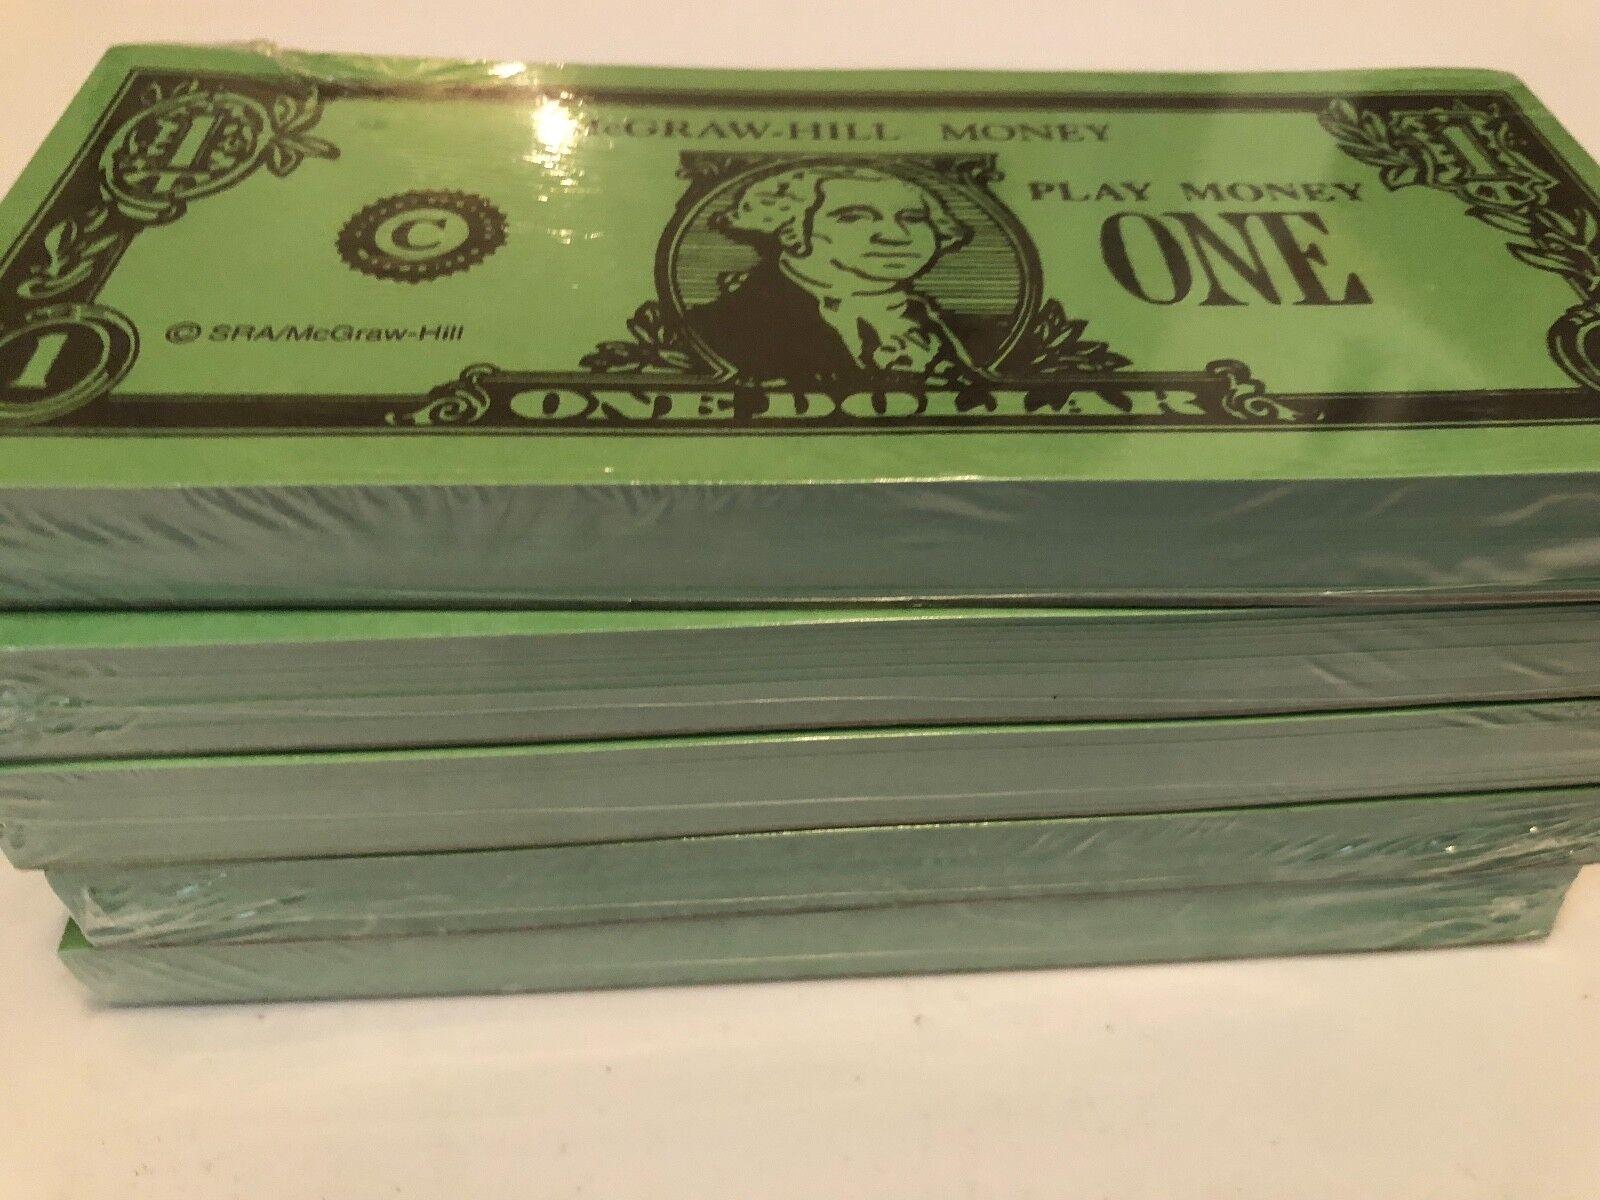 Lot of 5 Everyday Mathematics Mcgraw-Hill PLAY MONEY Homeschool Set of 100 bills